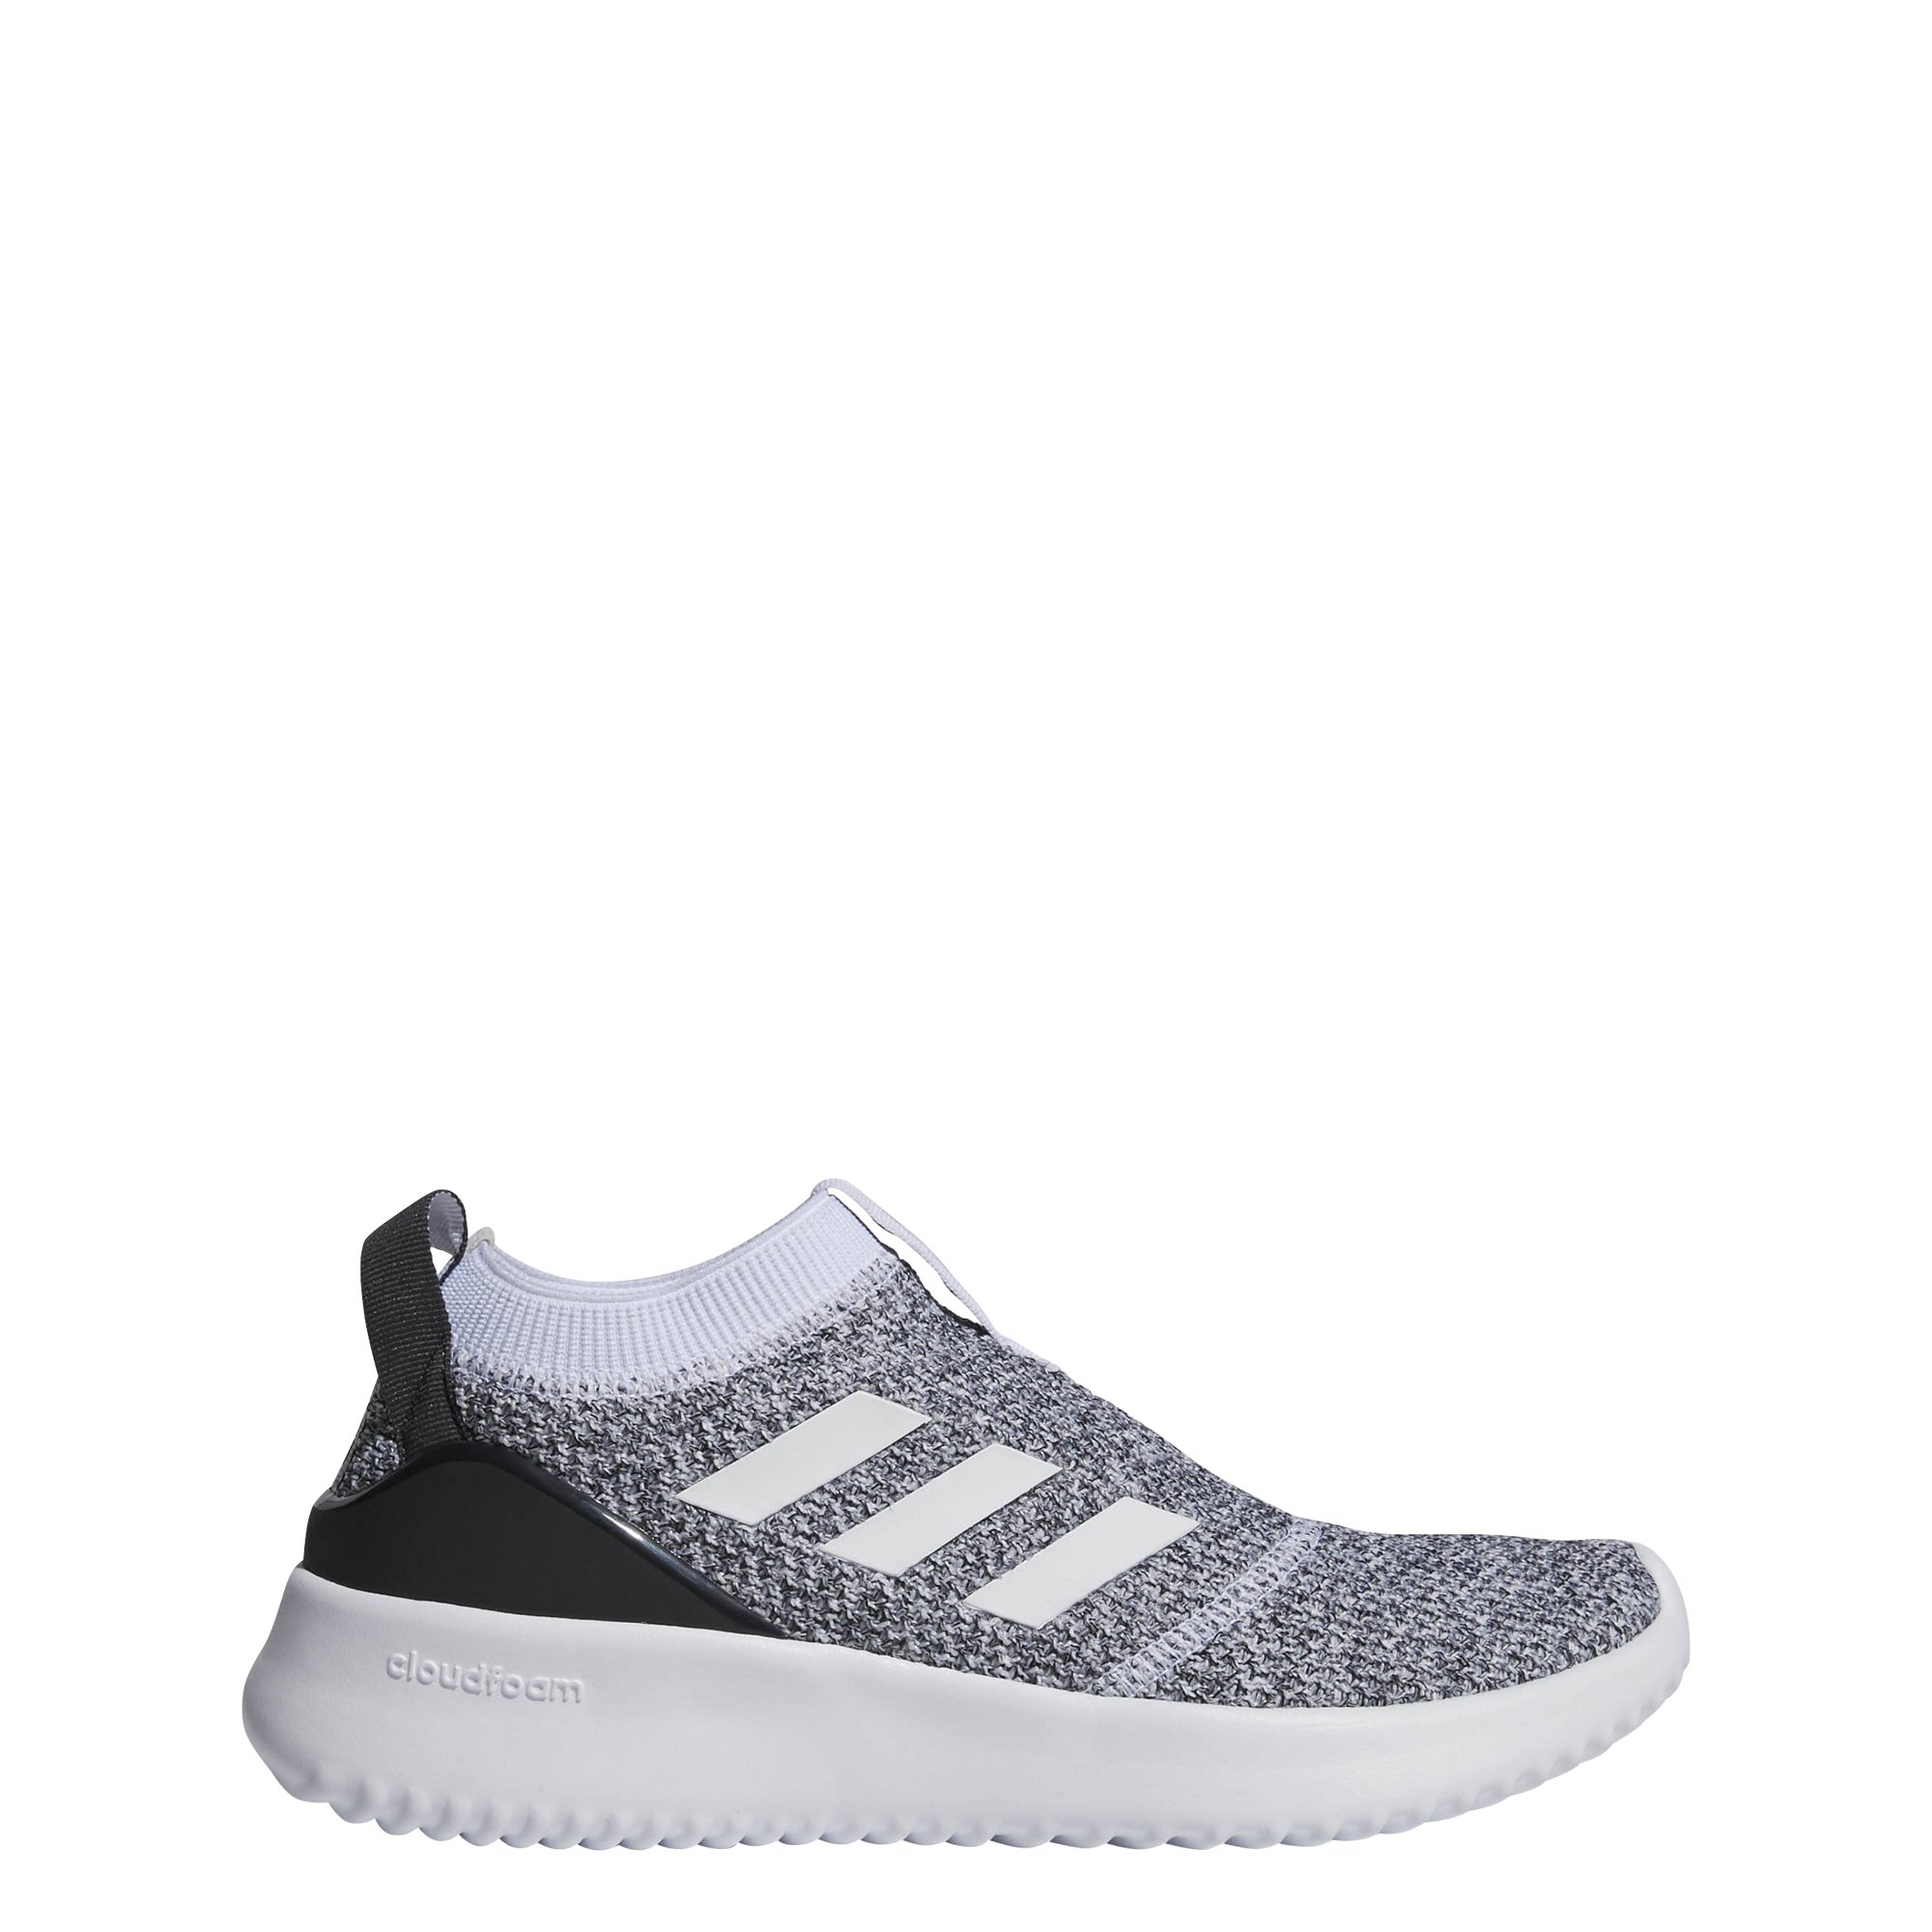 adidas Women's Ultimafusion Running Shoe, White/White/Black, 8 M US by adidas (Image #1)